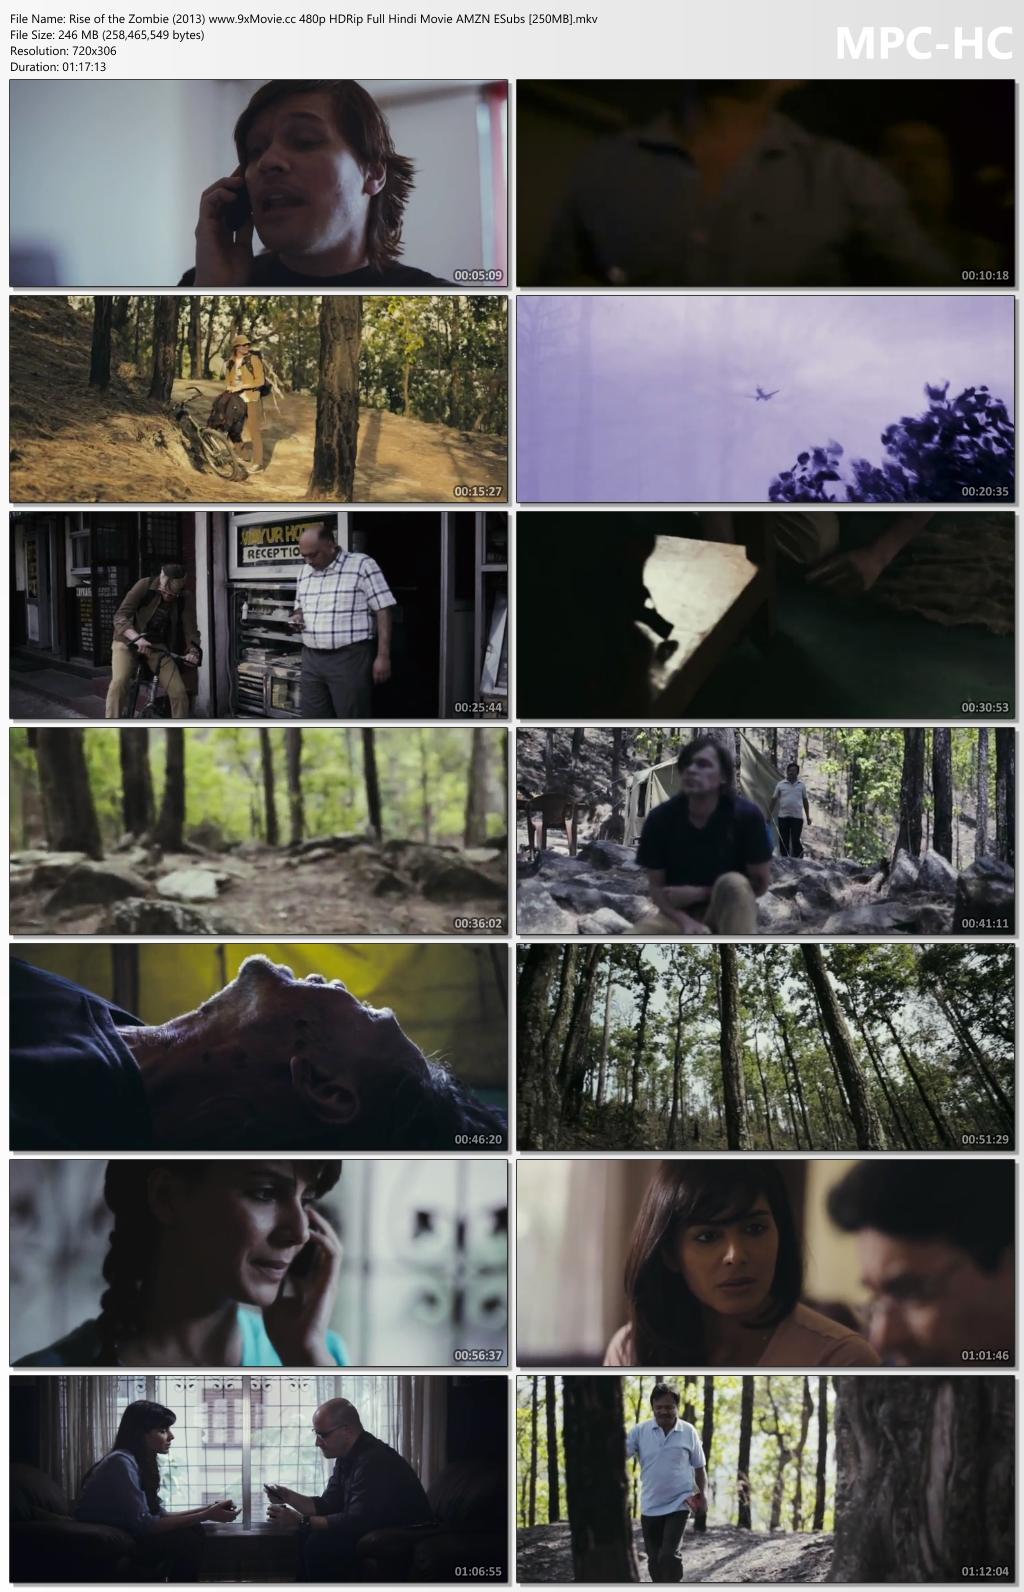 Rise-of-the-Zombie-2013-www-9x-Movie-cc-480p-HDRip-Full-Hindi-Movie-AMZN-ESubs-250-MB-mkv